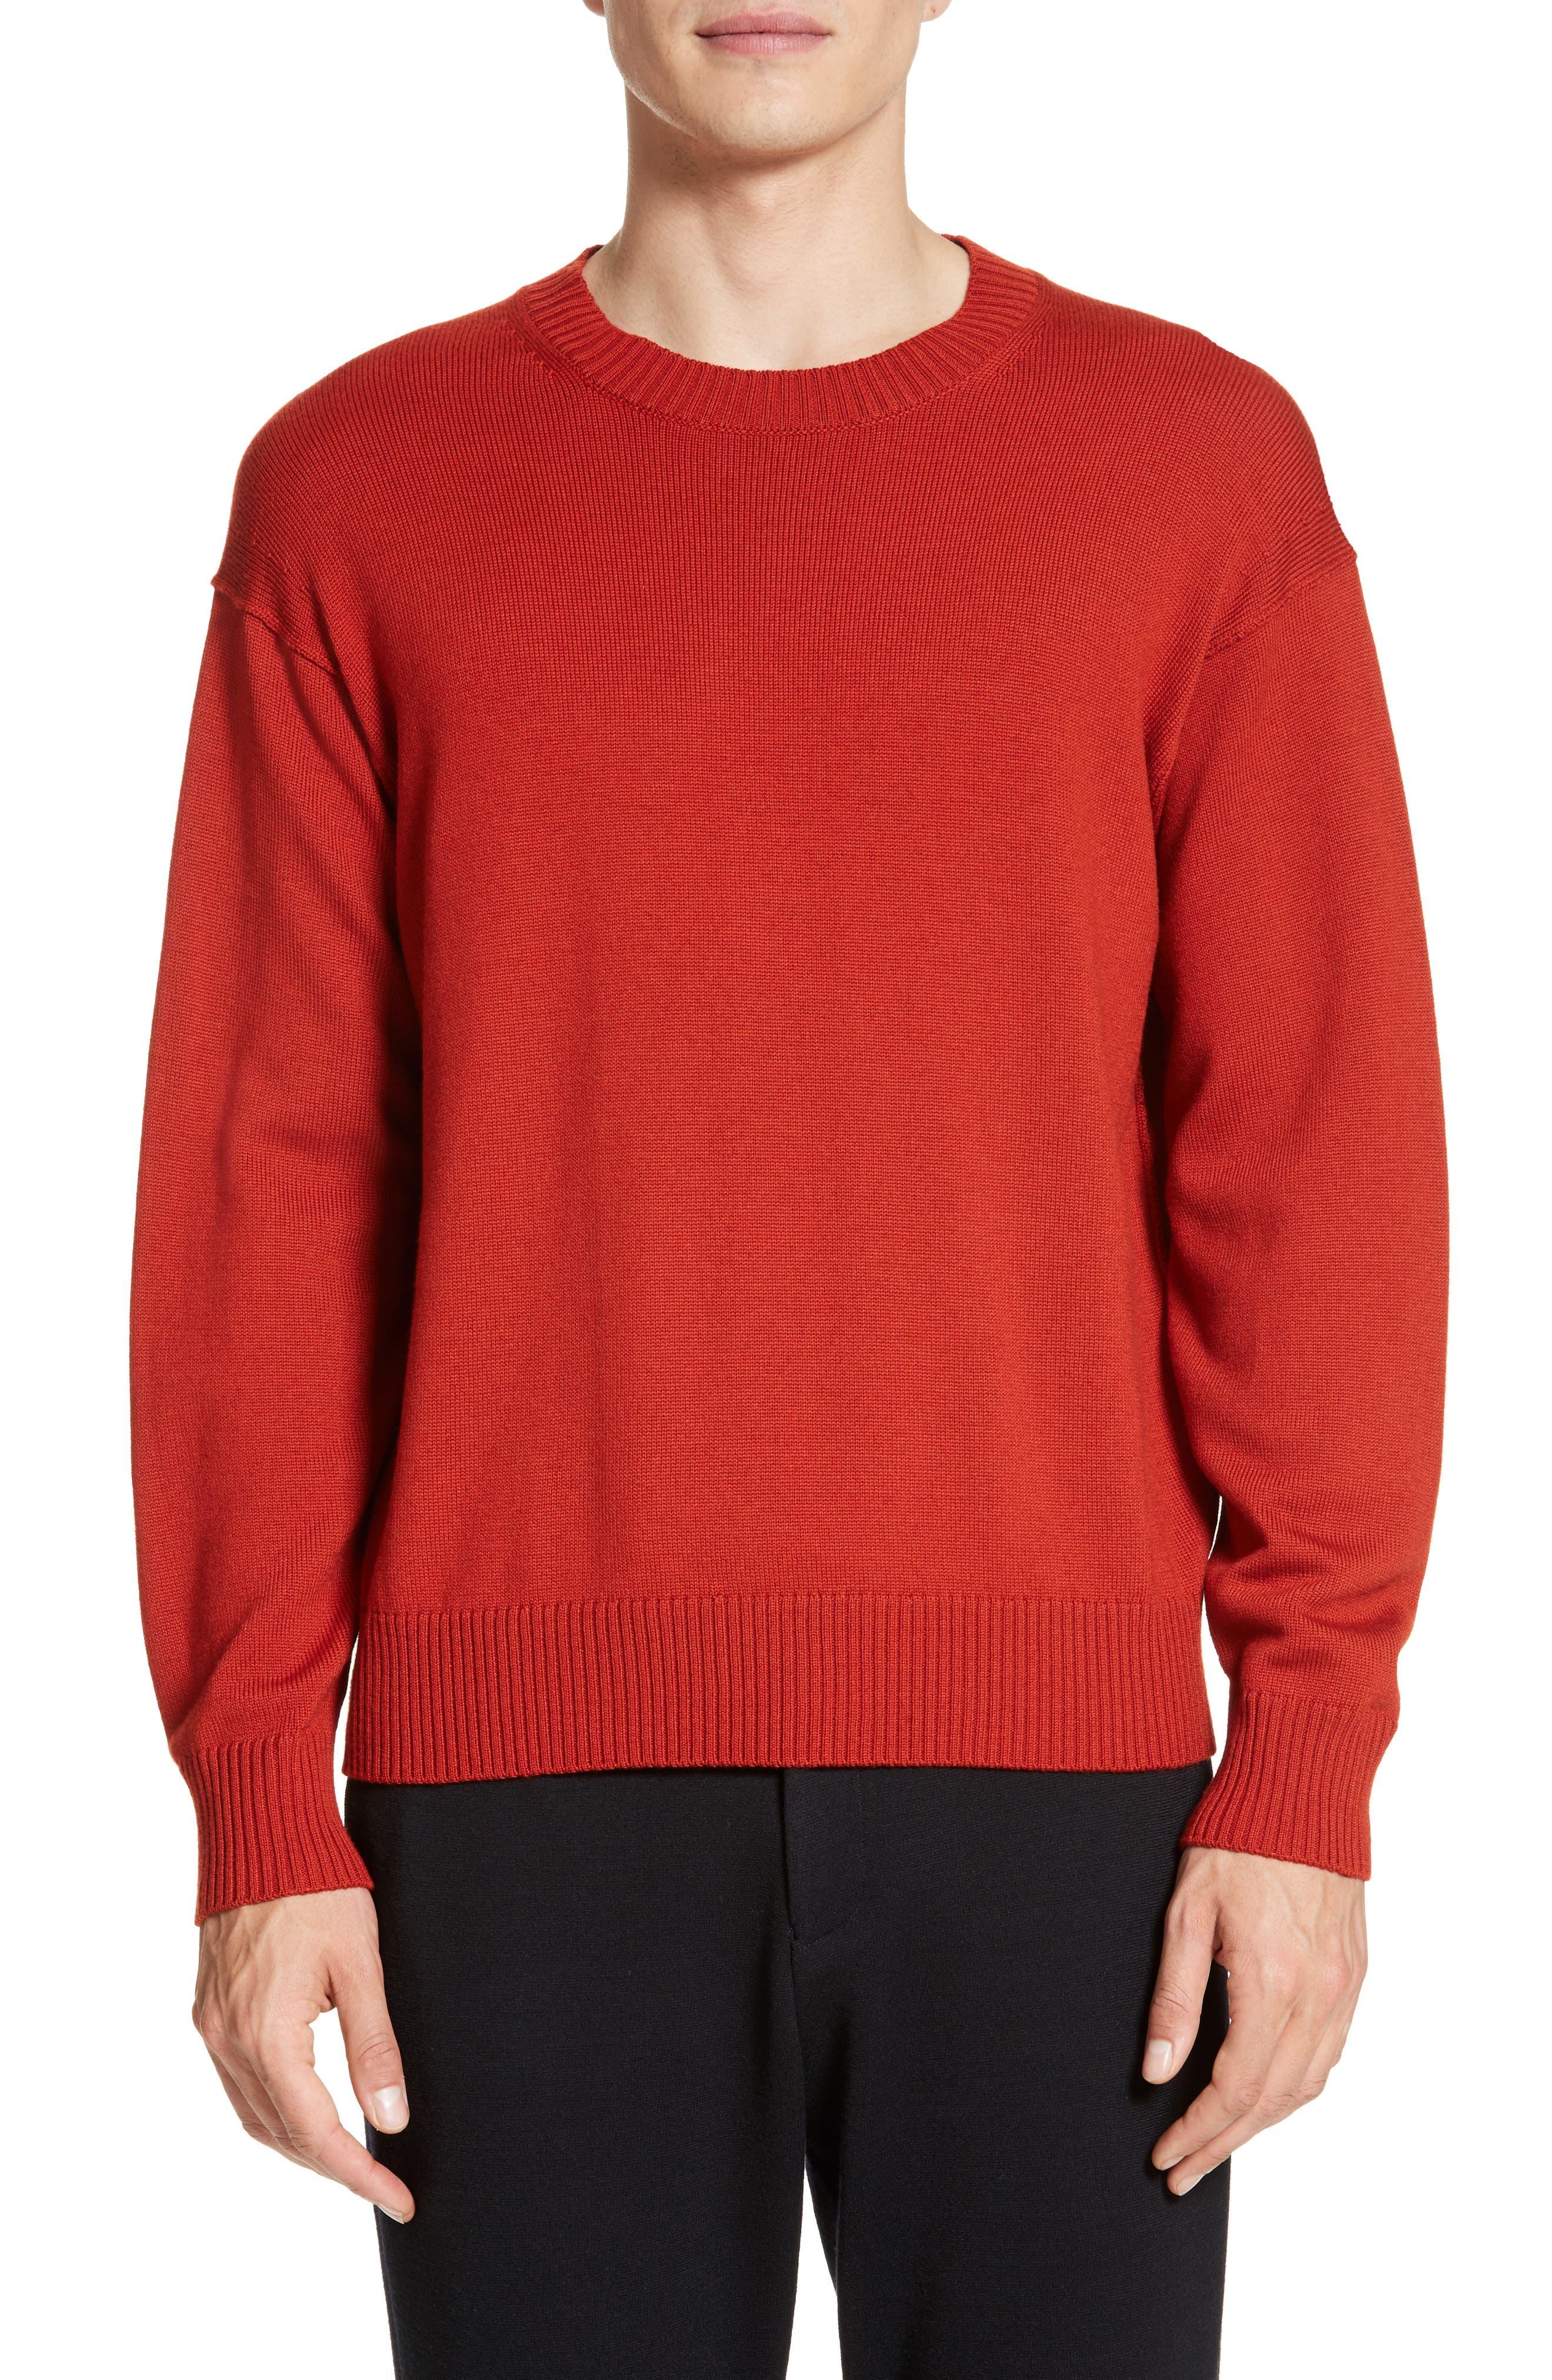 Alternate Image 1 Selected - Tomorrowland Merino Sweater